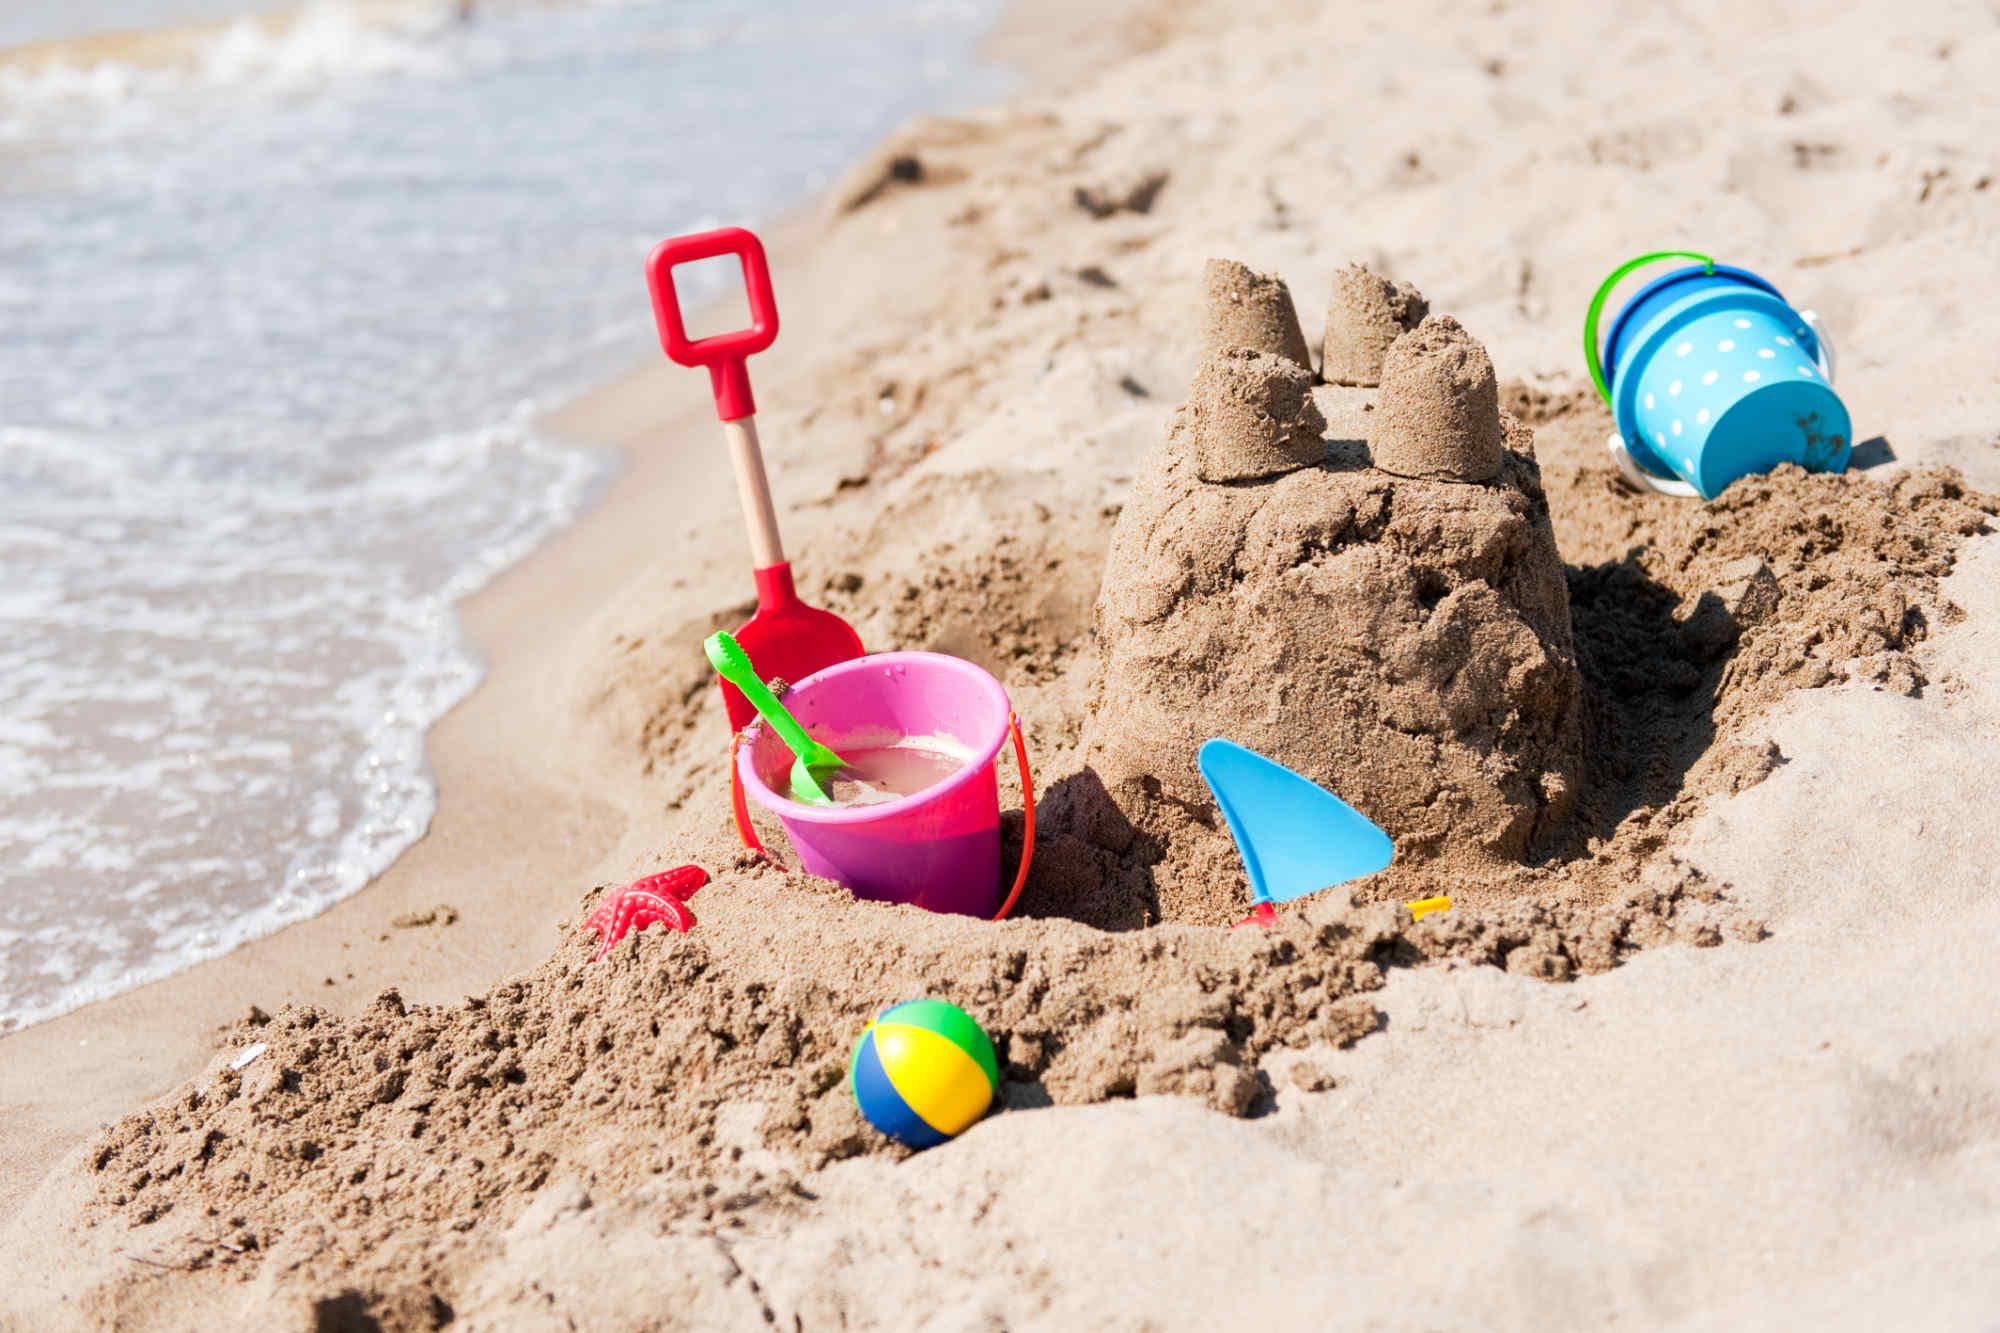 sand castle on the beach built by a child